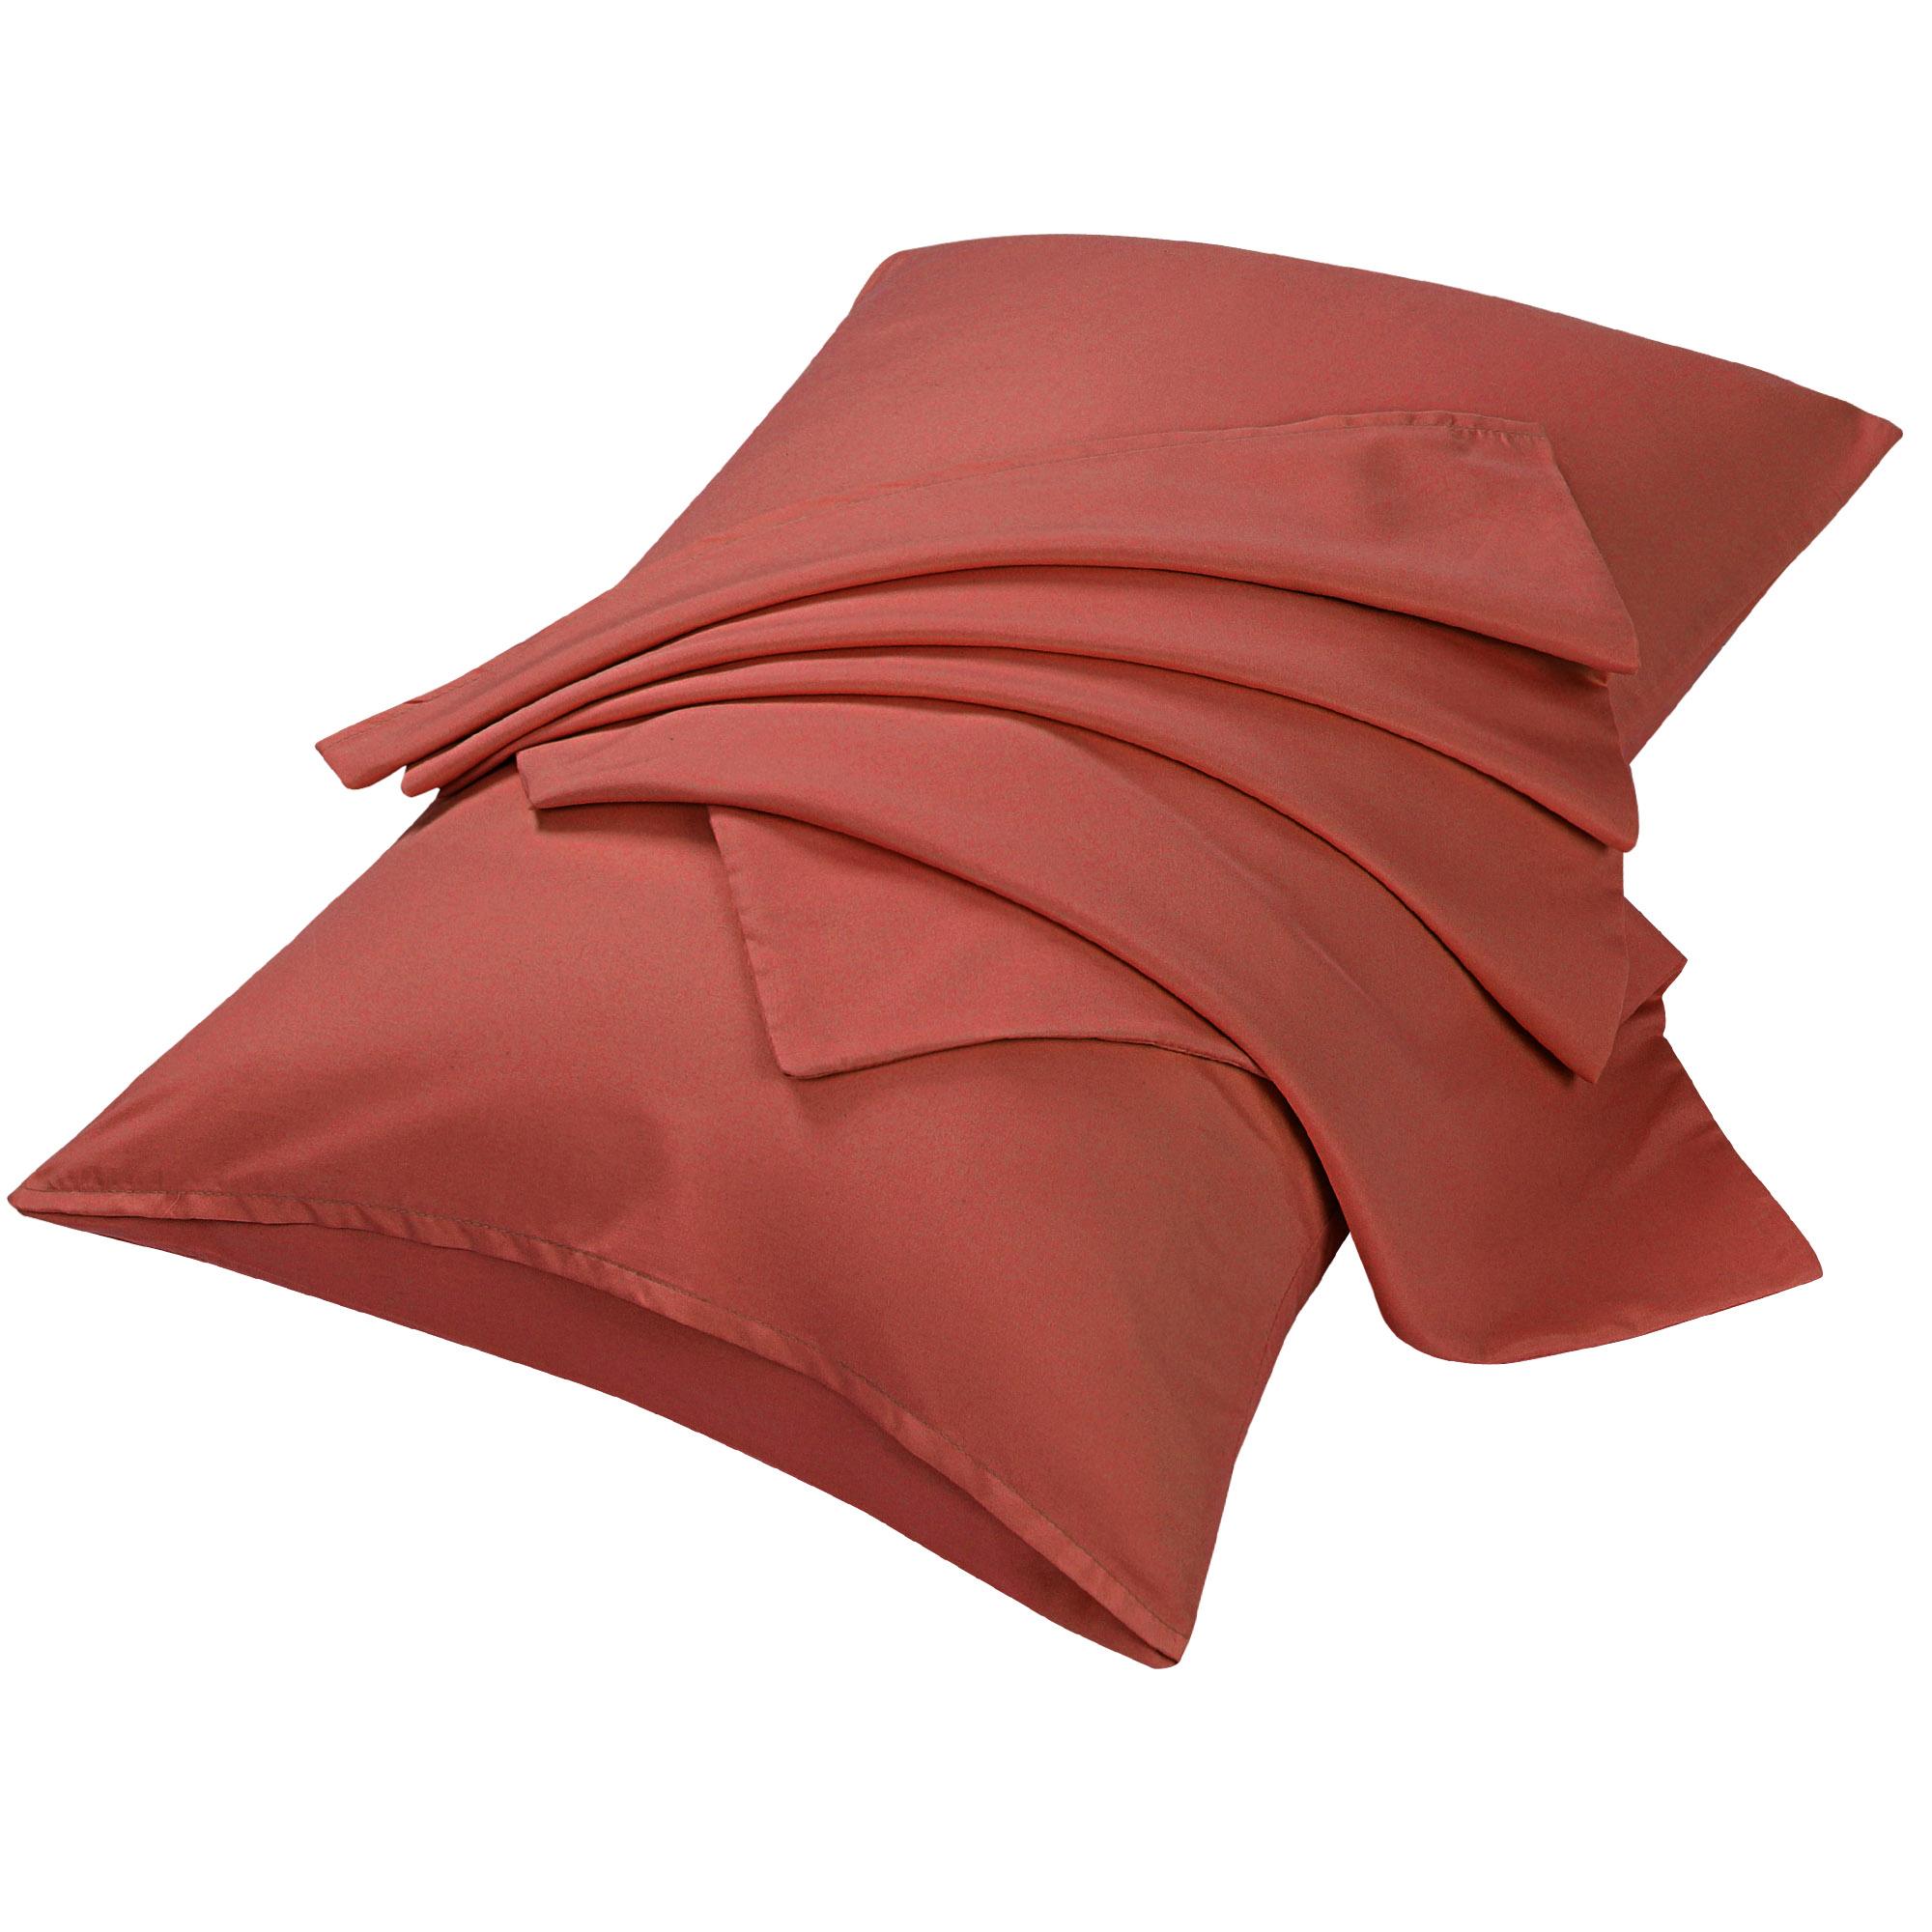 "2pcs Pillowcases Soft Microfiber, No Wrinkle, Orange Travel (14"" x 20"")"